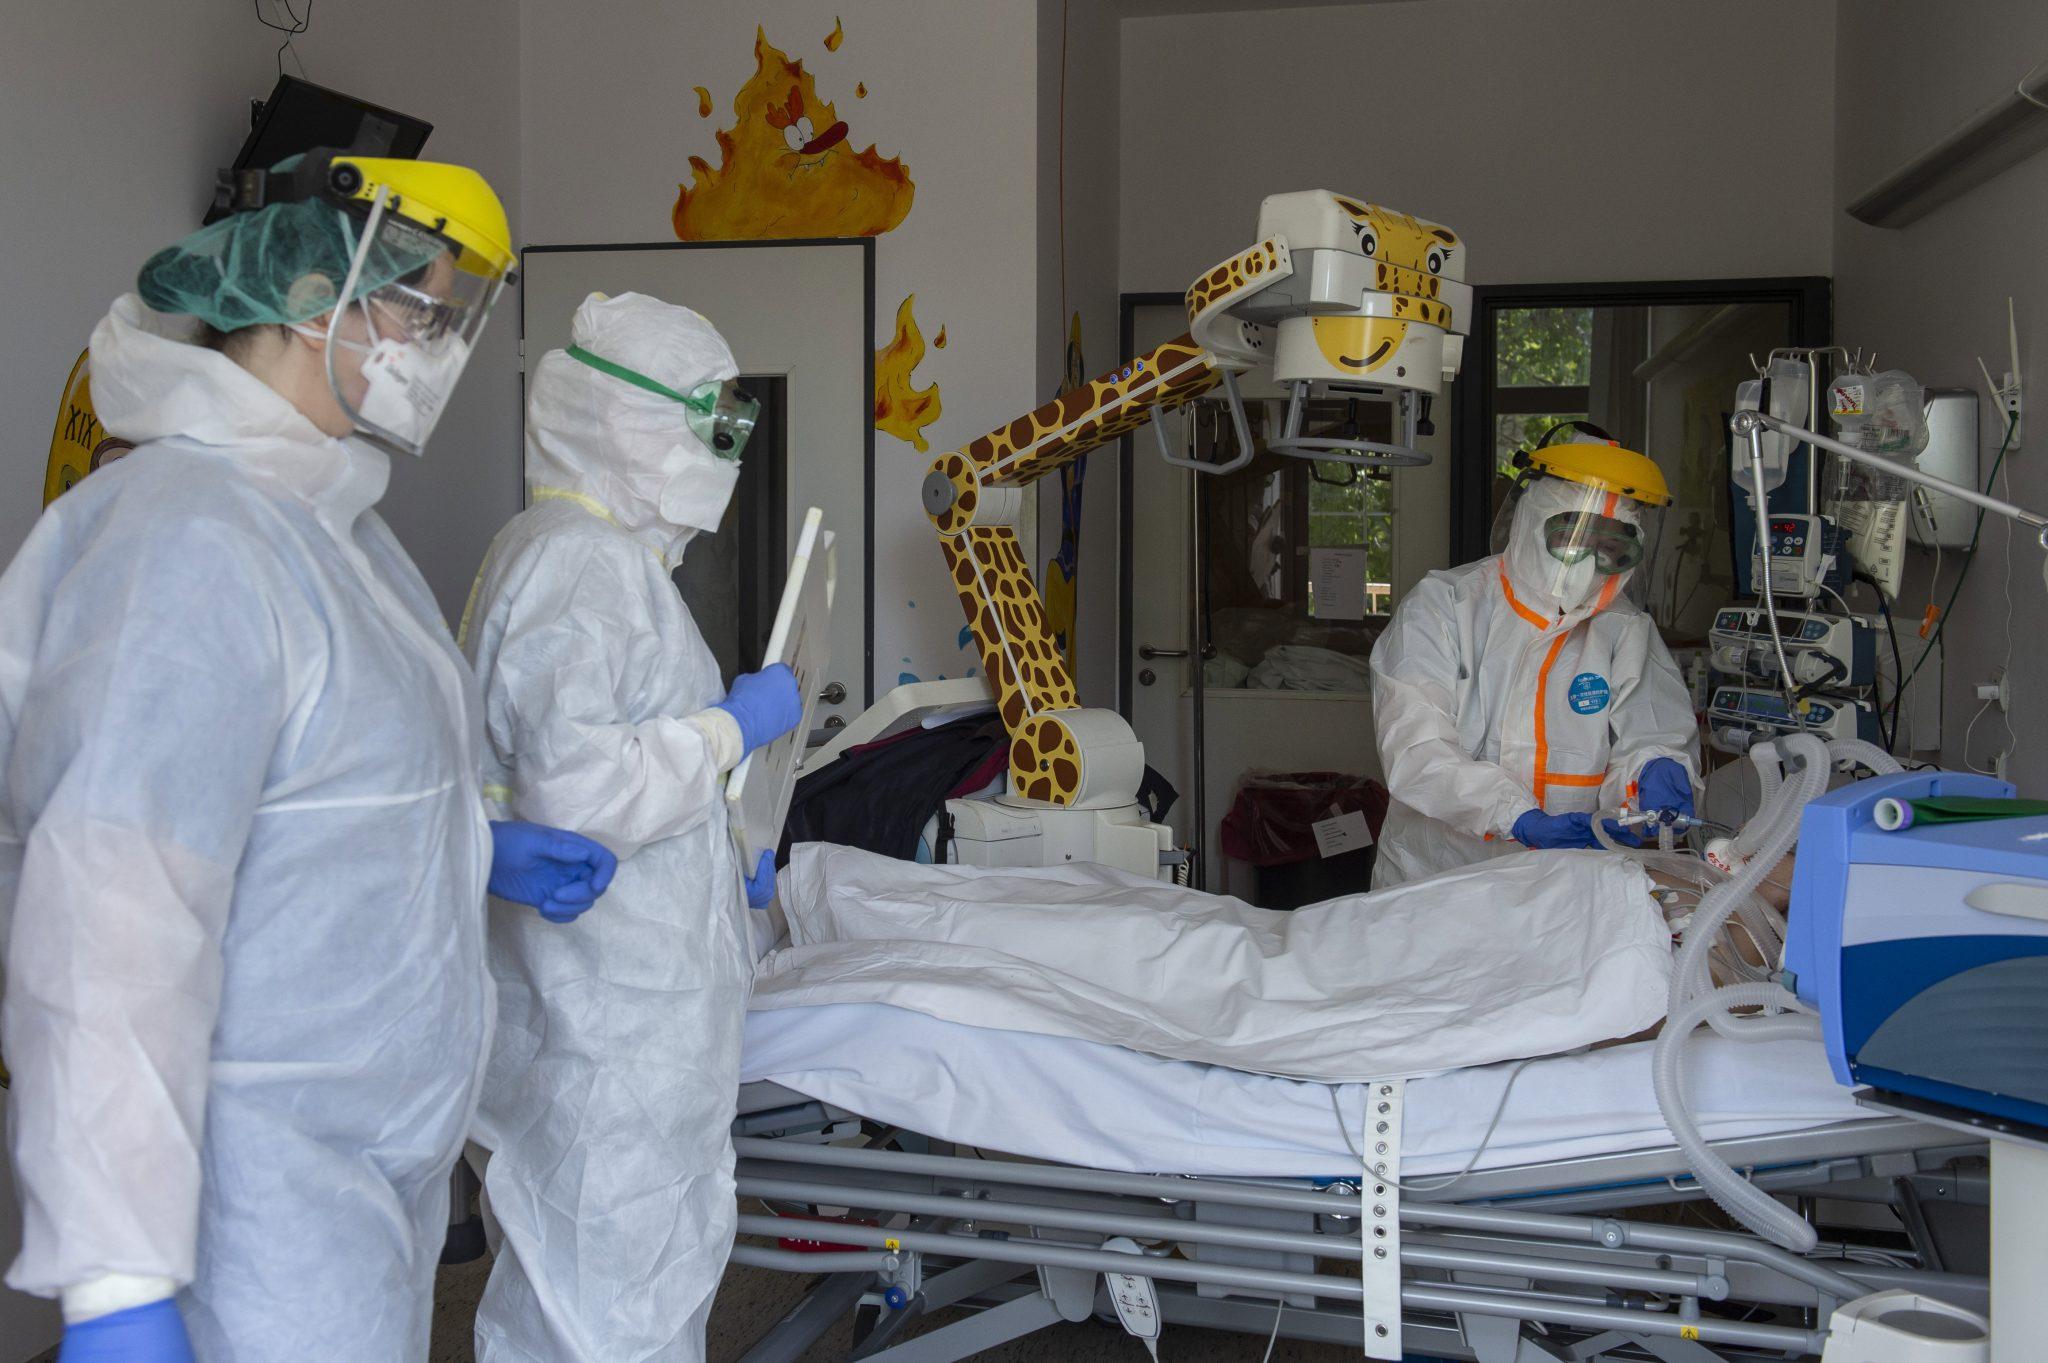 UK Coronavirus Variant Spreading Rapidly in Hungary